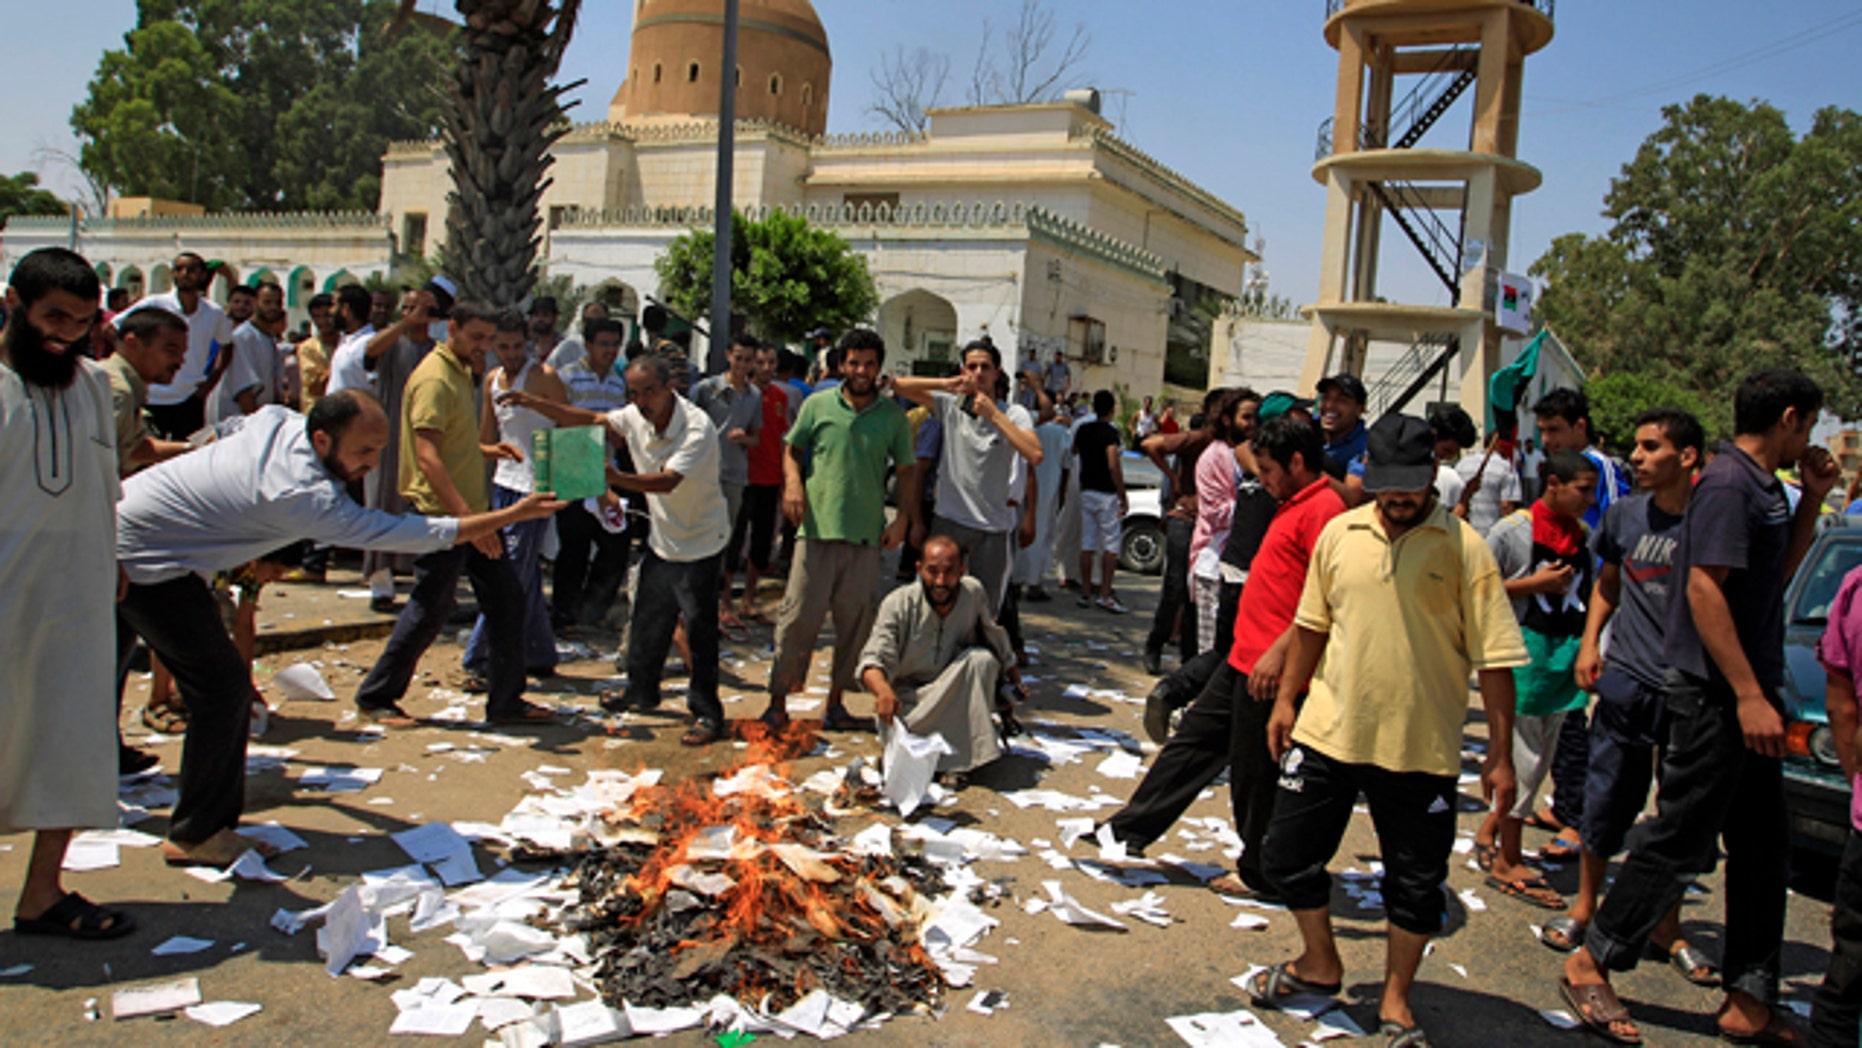 Aug. 27: Rebel supporters burn Green books in the main square of the Qasr Bin Ghashir district in Tripoli, Libya.